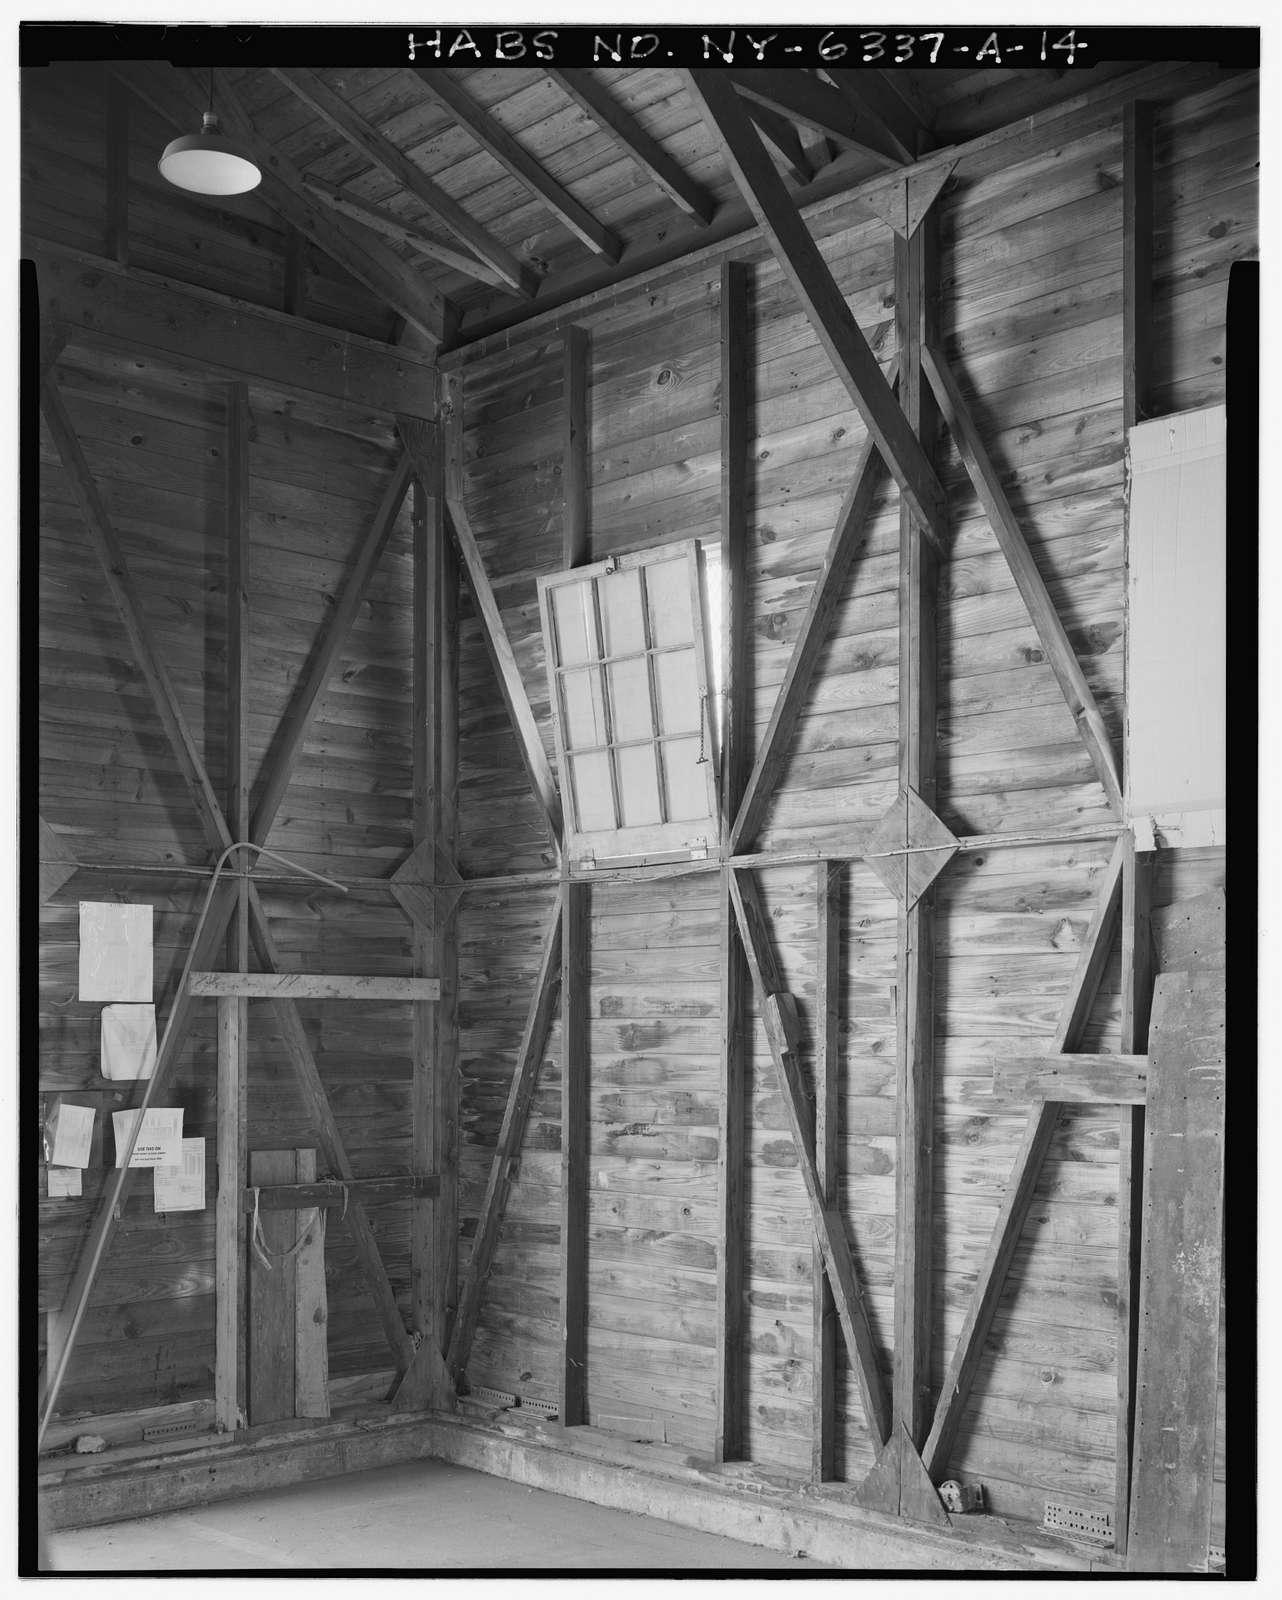 Fort Drum, Ordnance Warehouse, Northwest corner of Railroad Street & Ordnance Road, Watertown, Jefferson County, NY